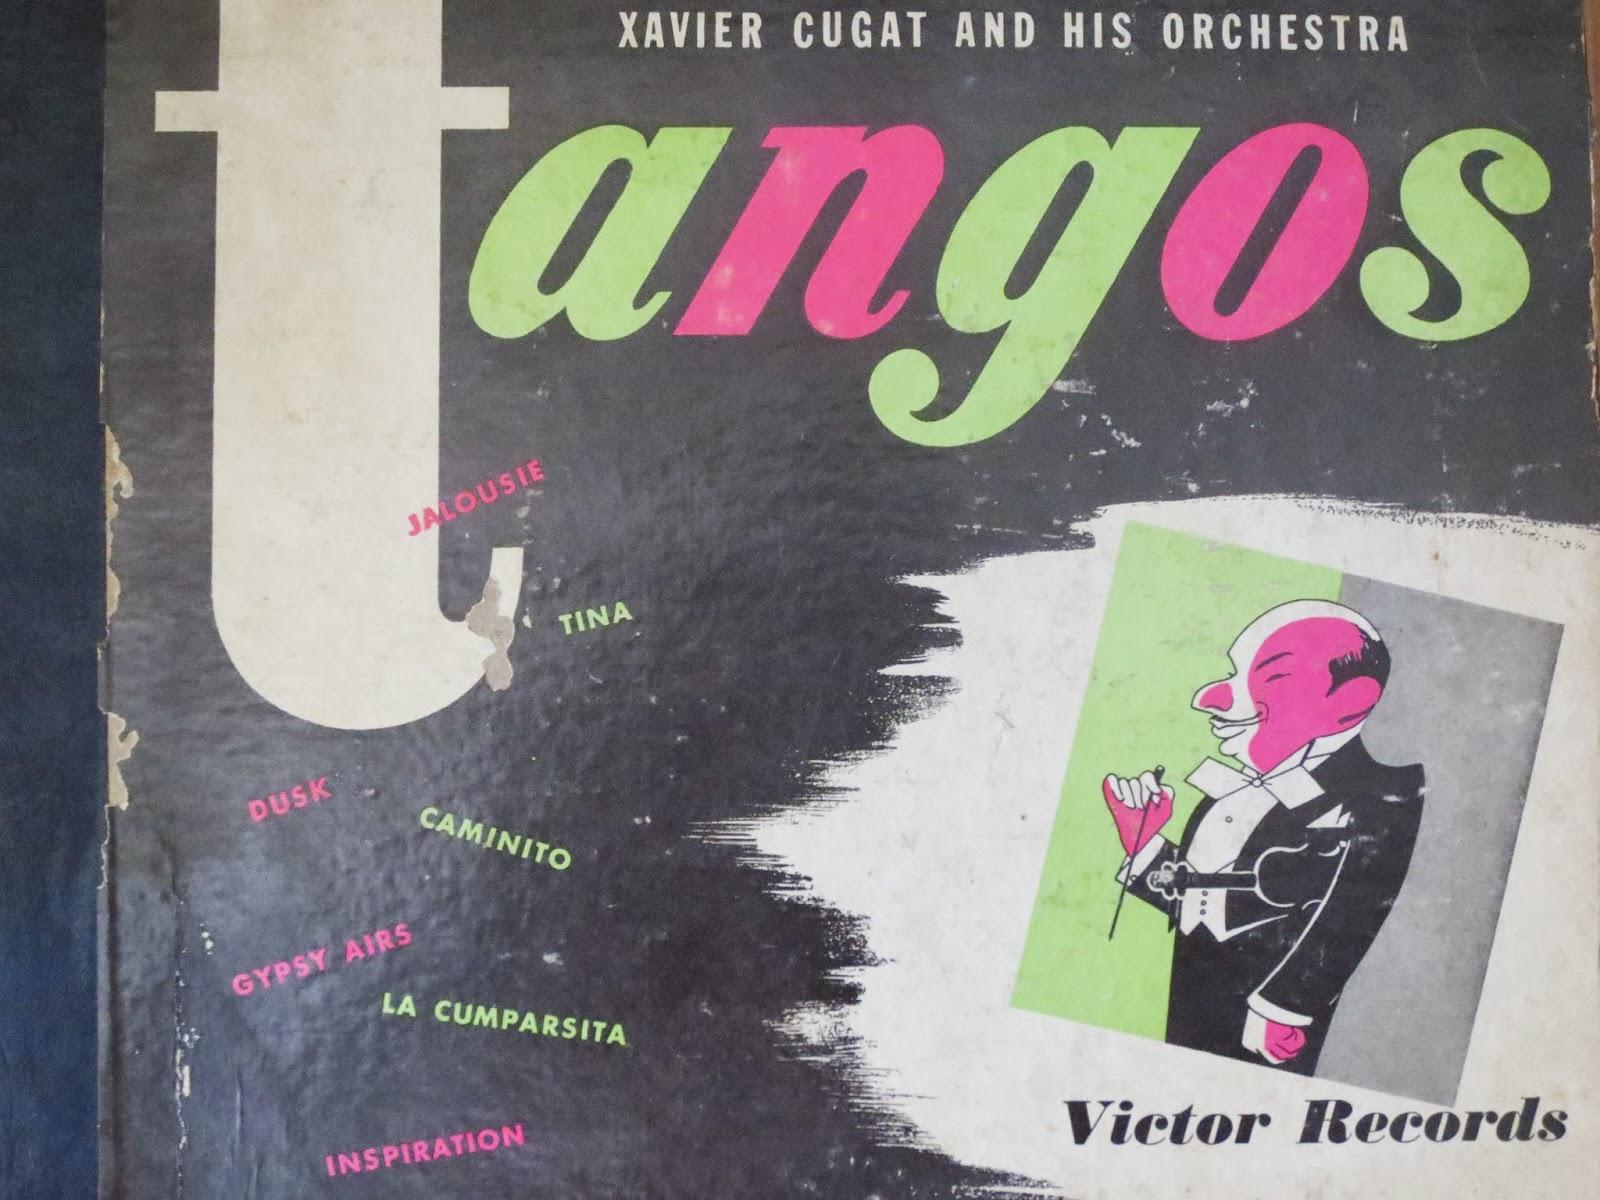 vintage xavier cugat tango records via Brentwood Lane